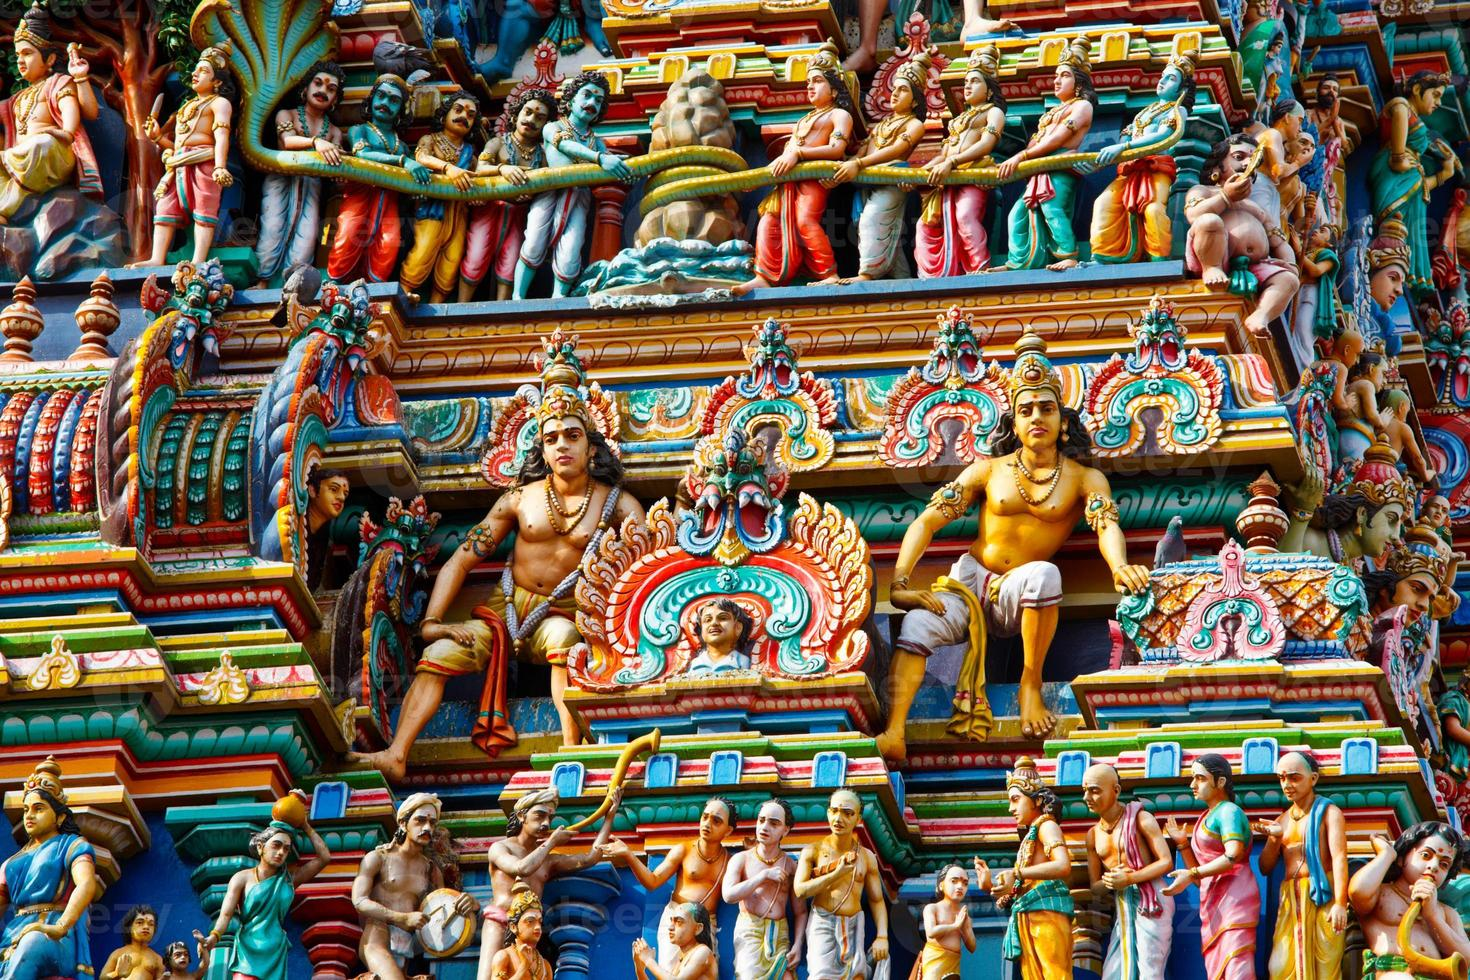 kleurrijke gopuram toren van hindoe-tempel foto